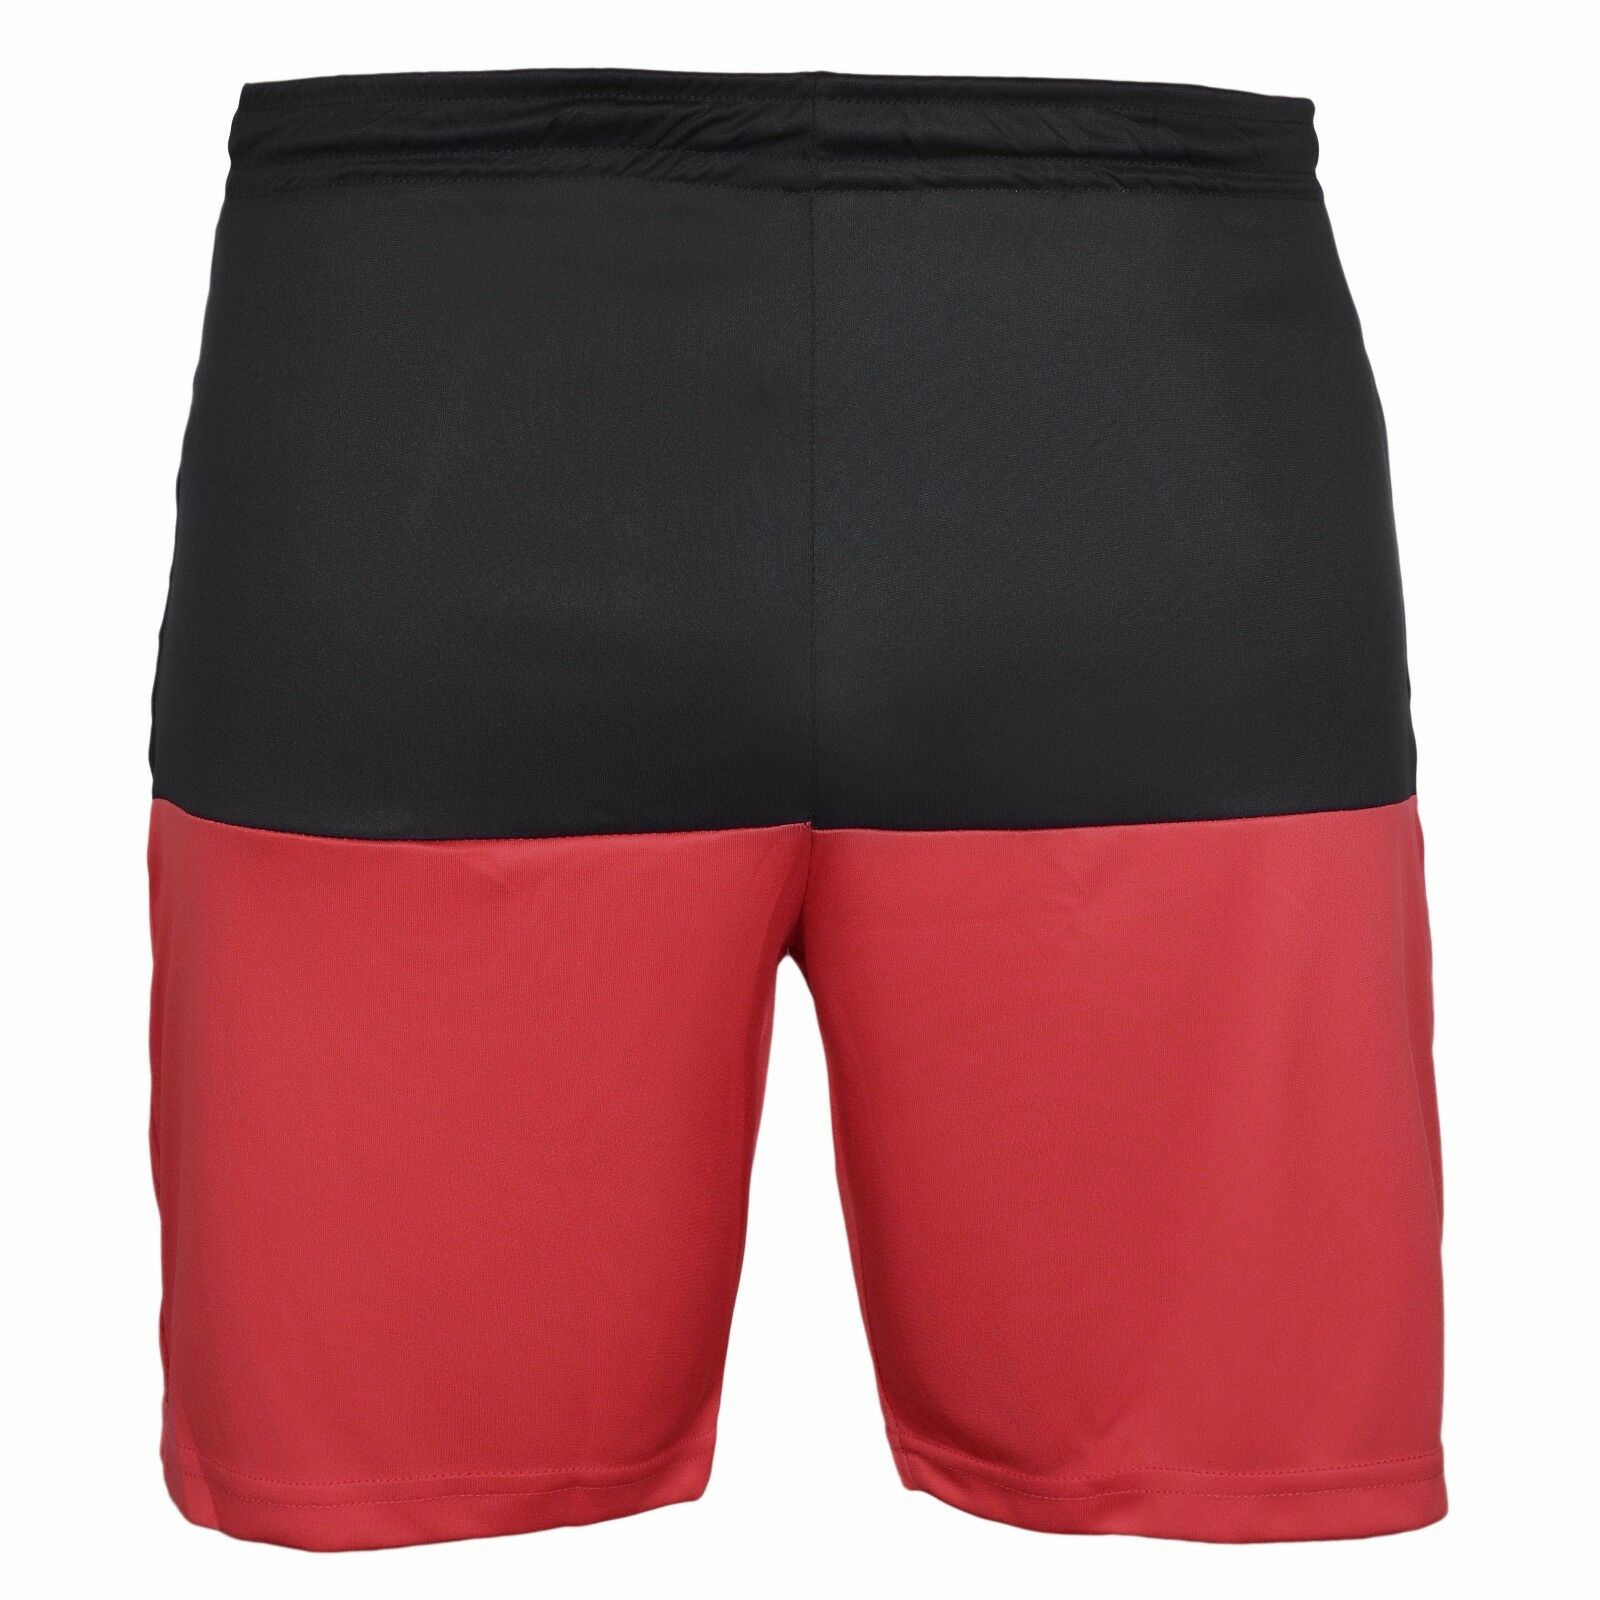 BLACK/RED-H